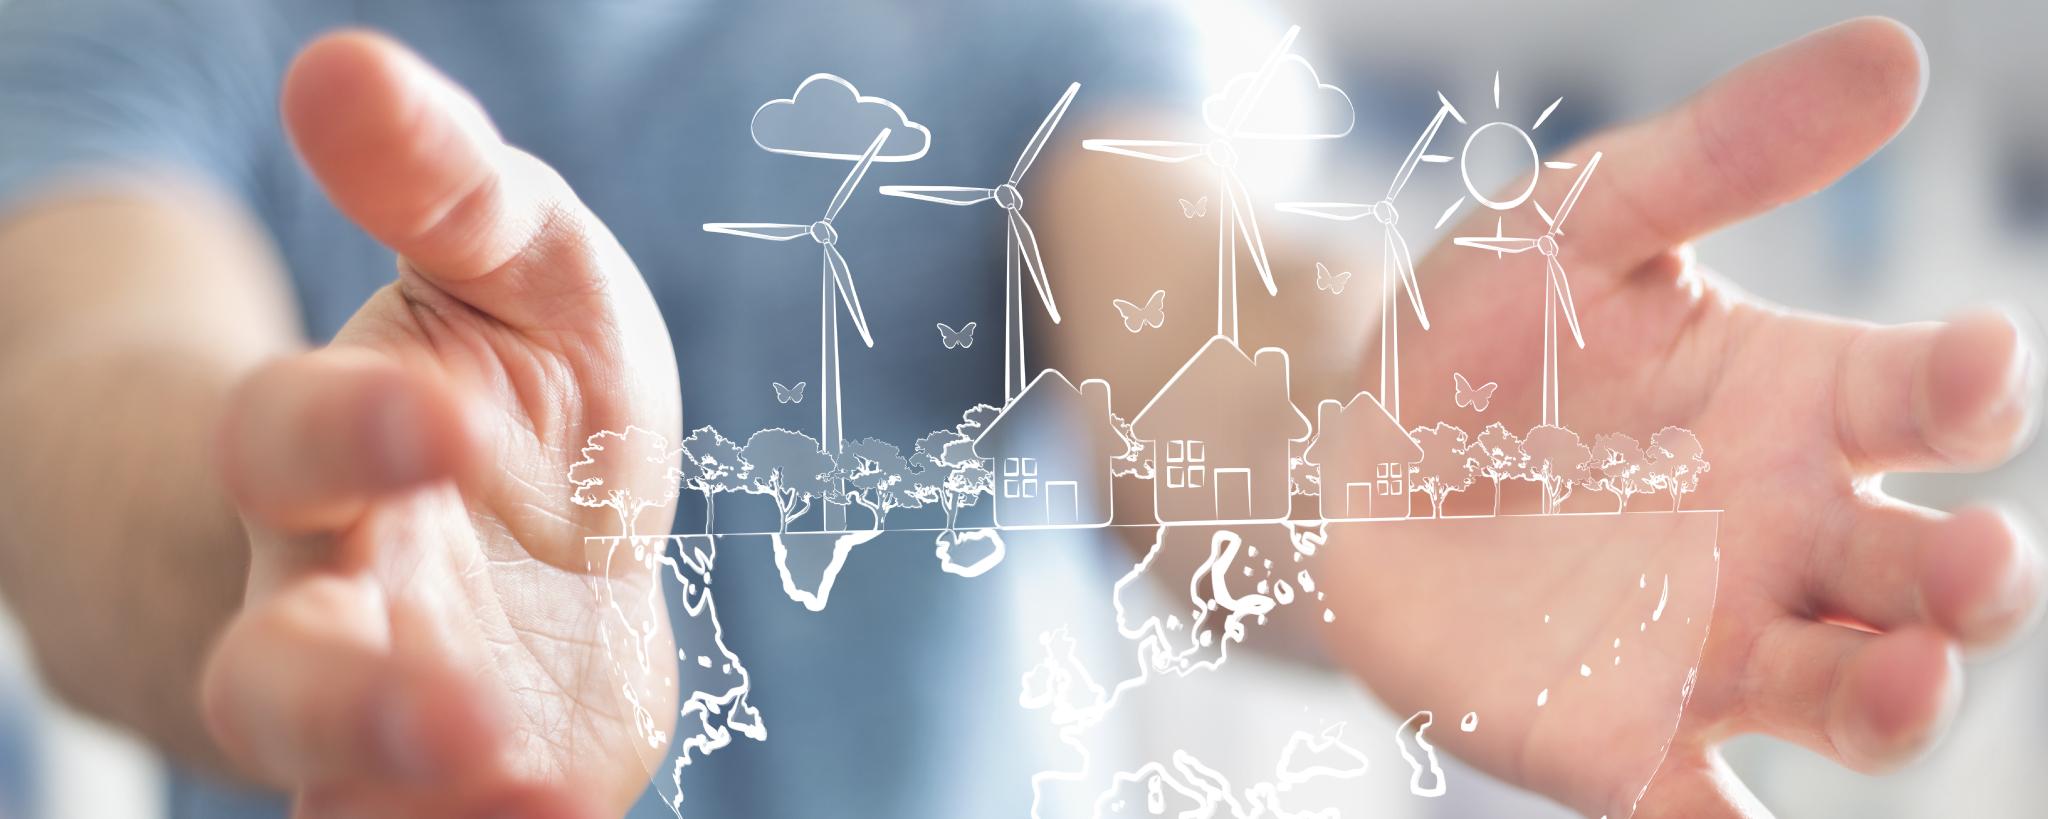 ESG - Environmental, Social e Governance